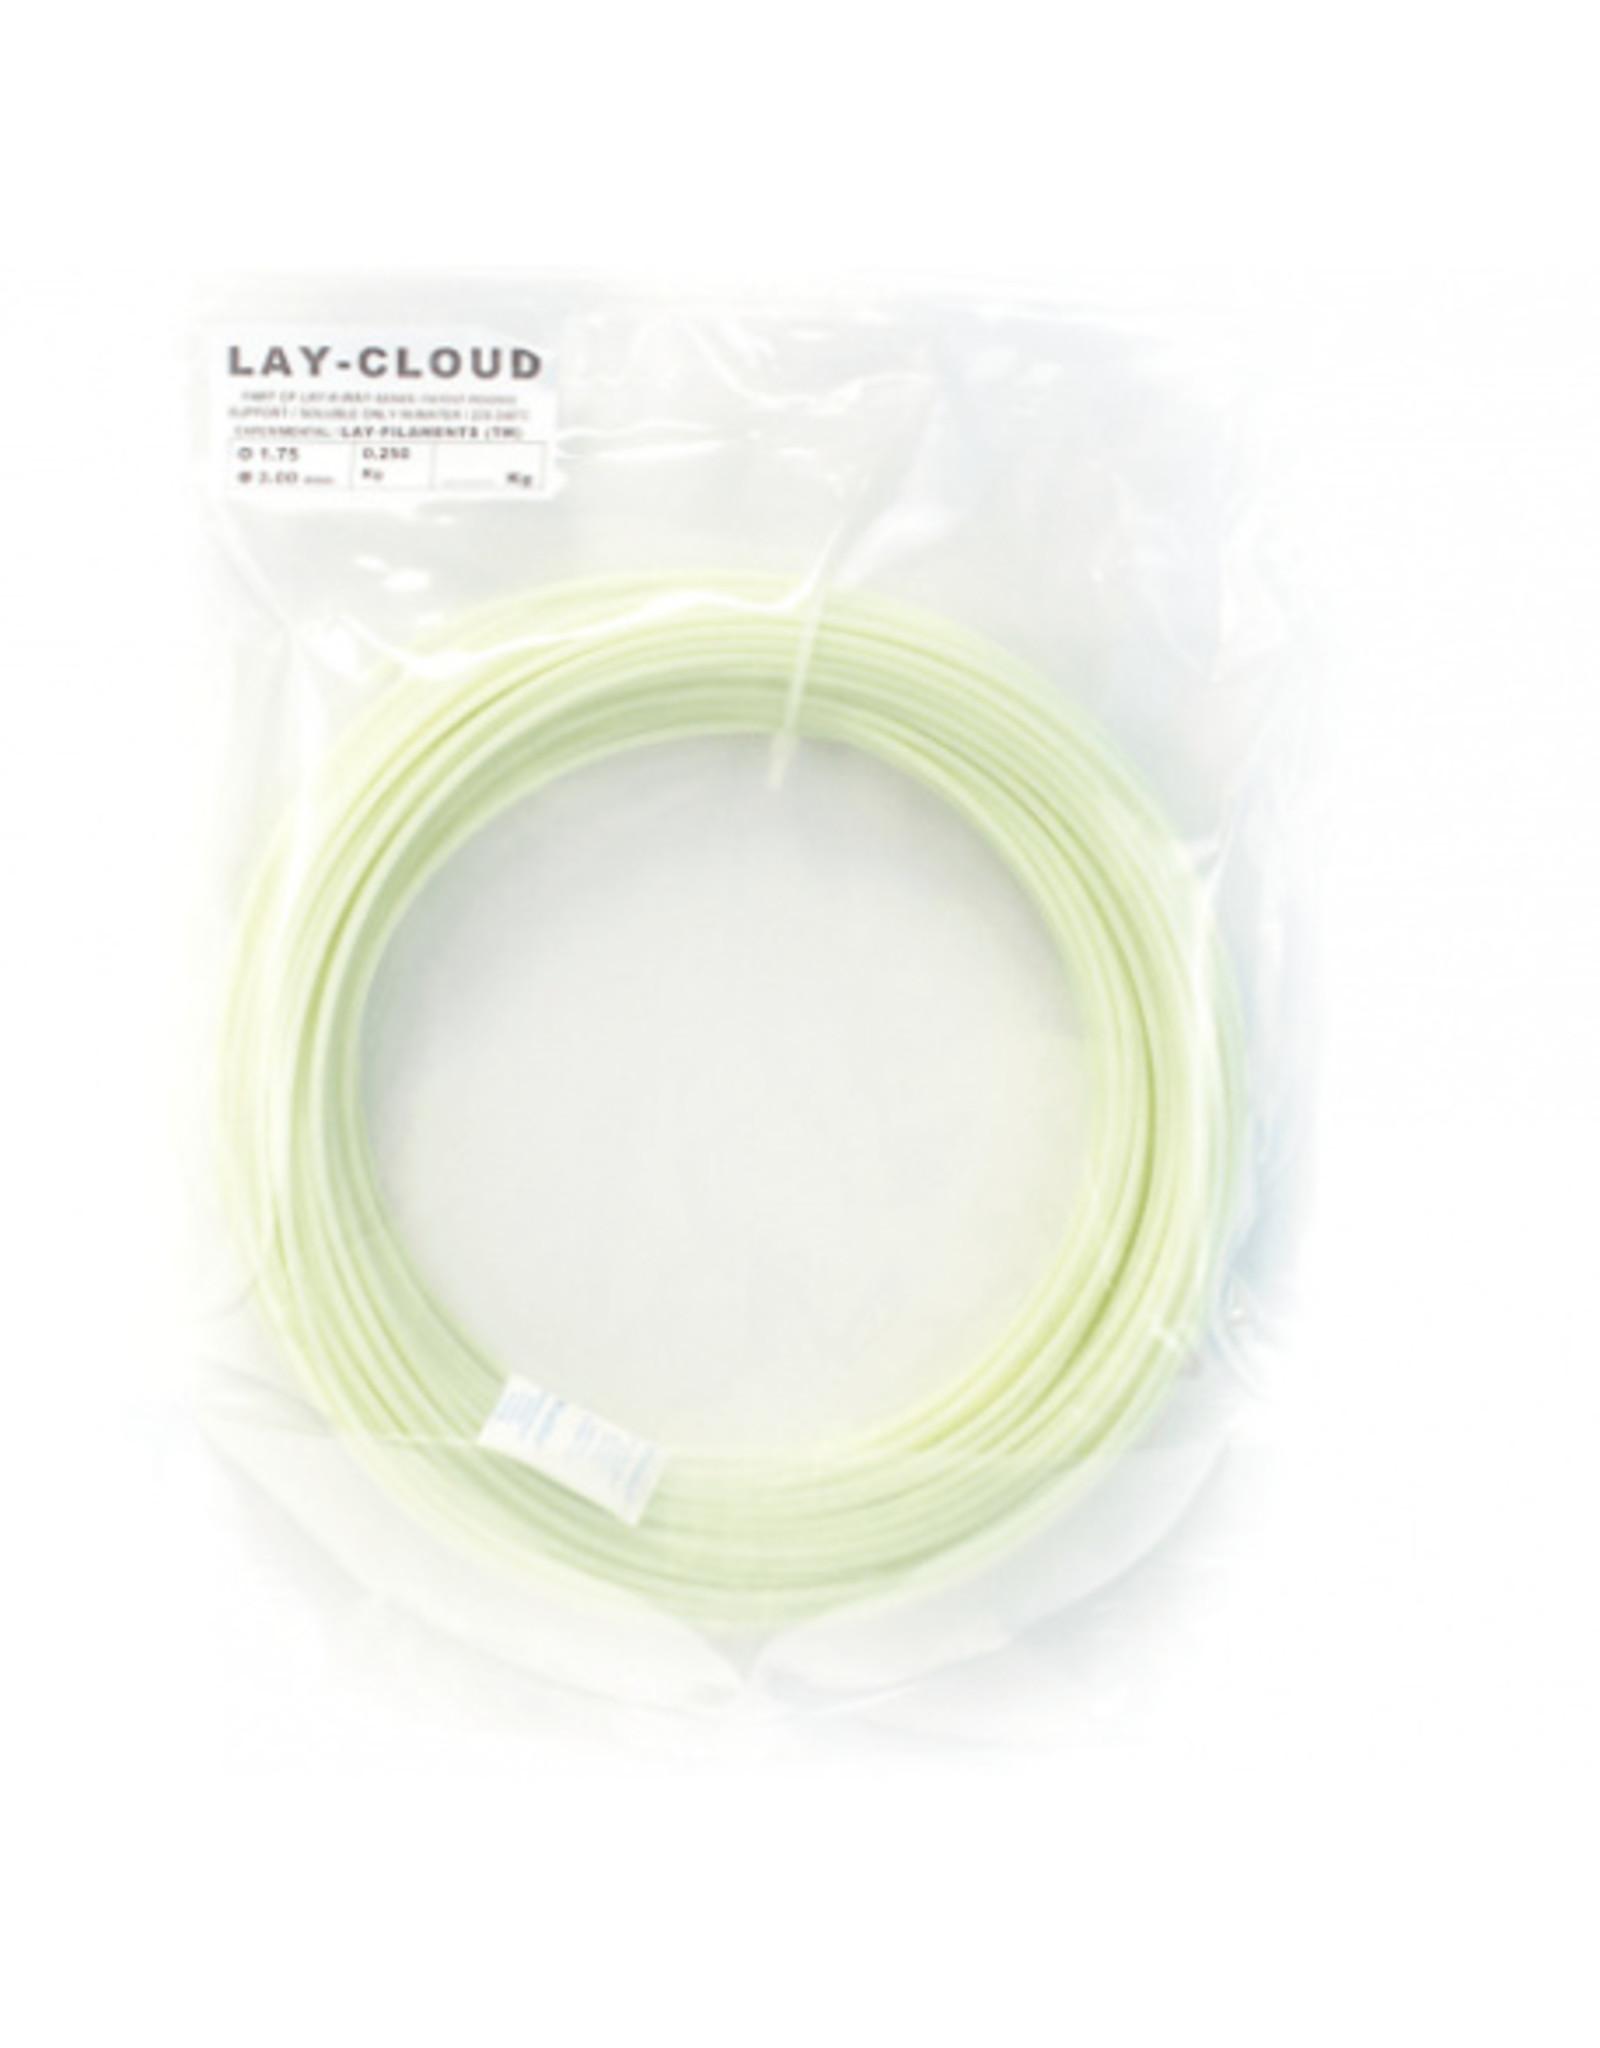 LAY Filaments Lay-Cloud 1.75mm 0.250kg